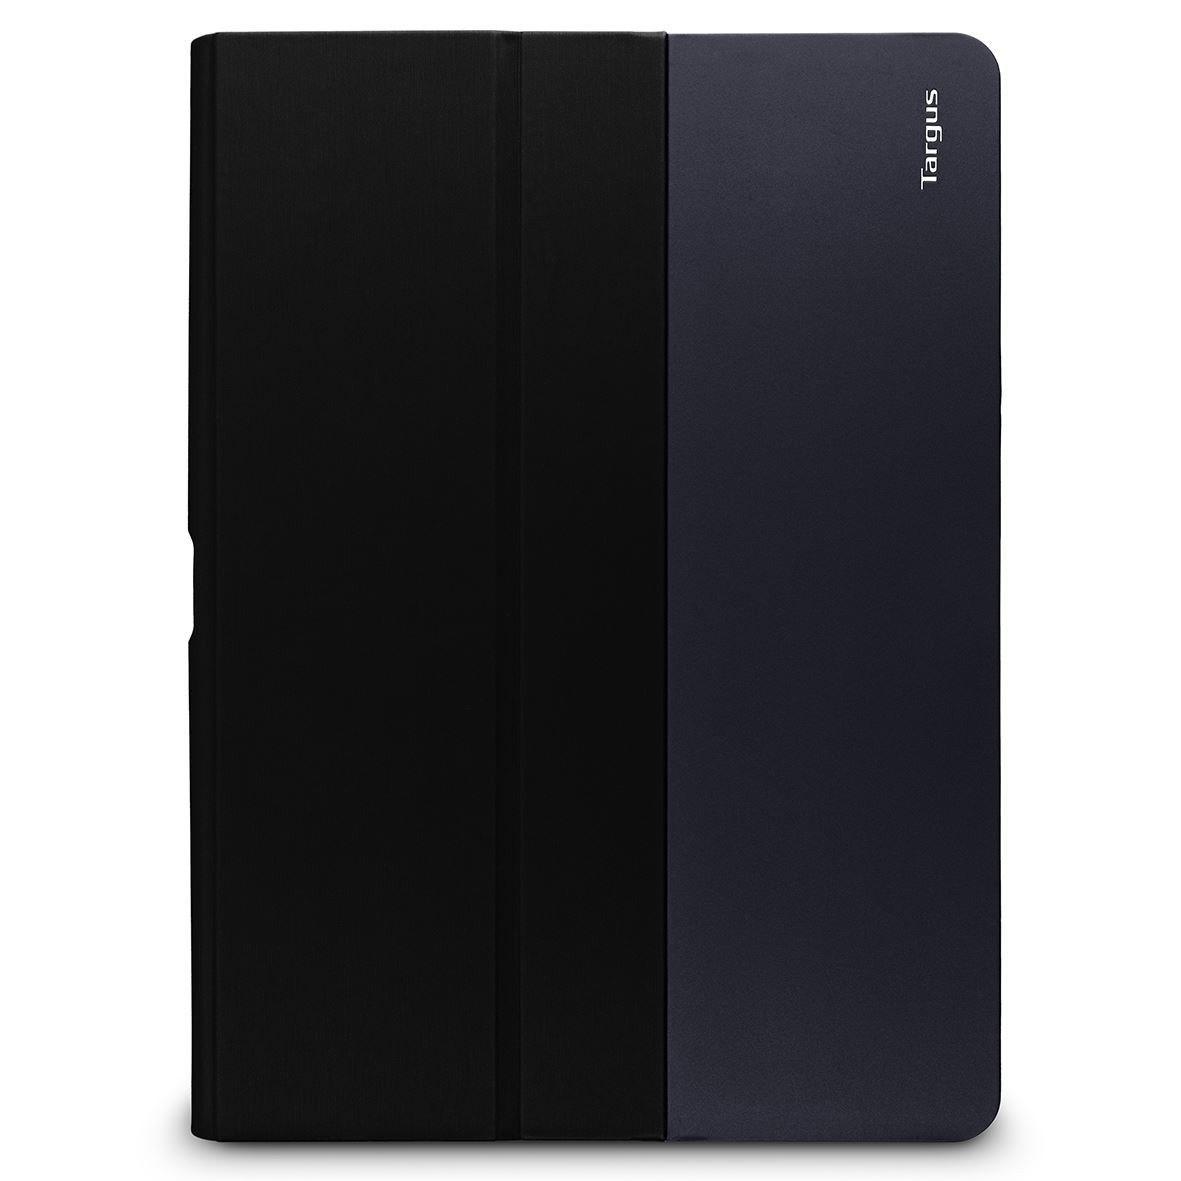 "Targus Fit N' Grip THZ662AU Carrying Case (Flip) for 20.3 cm (8"") Tablet - Black"